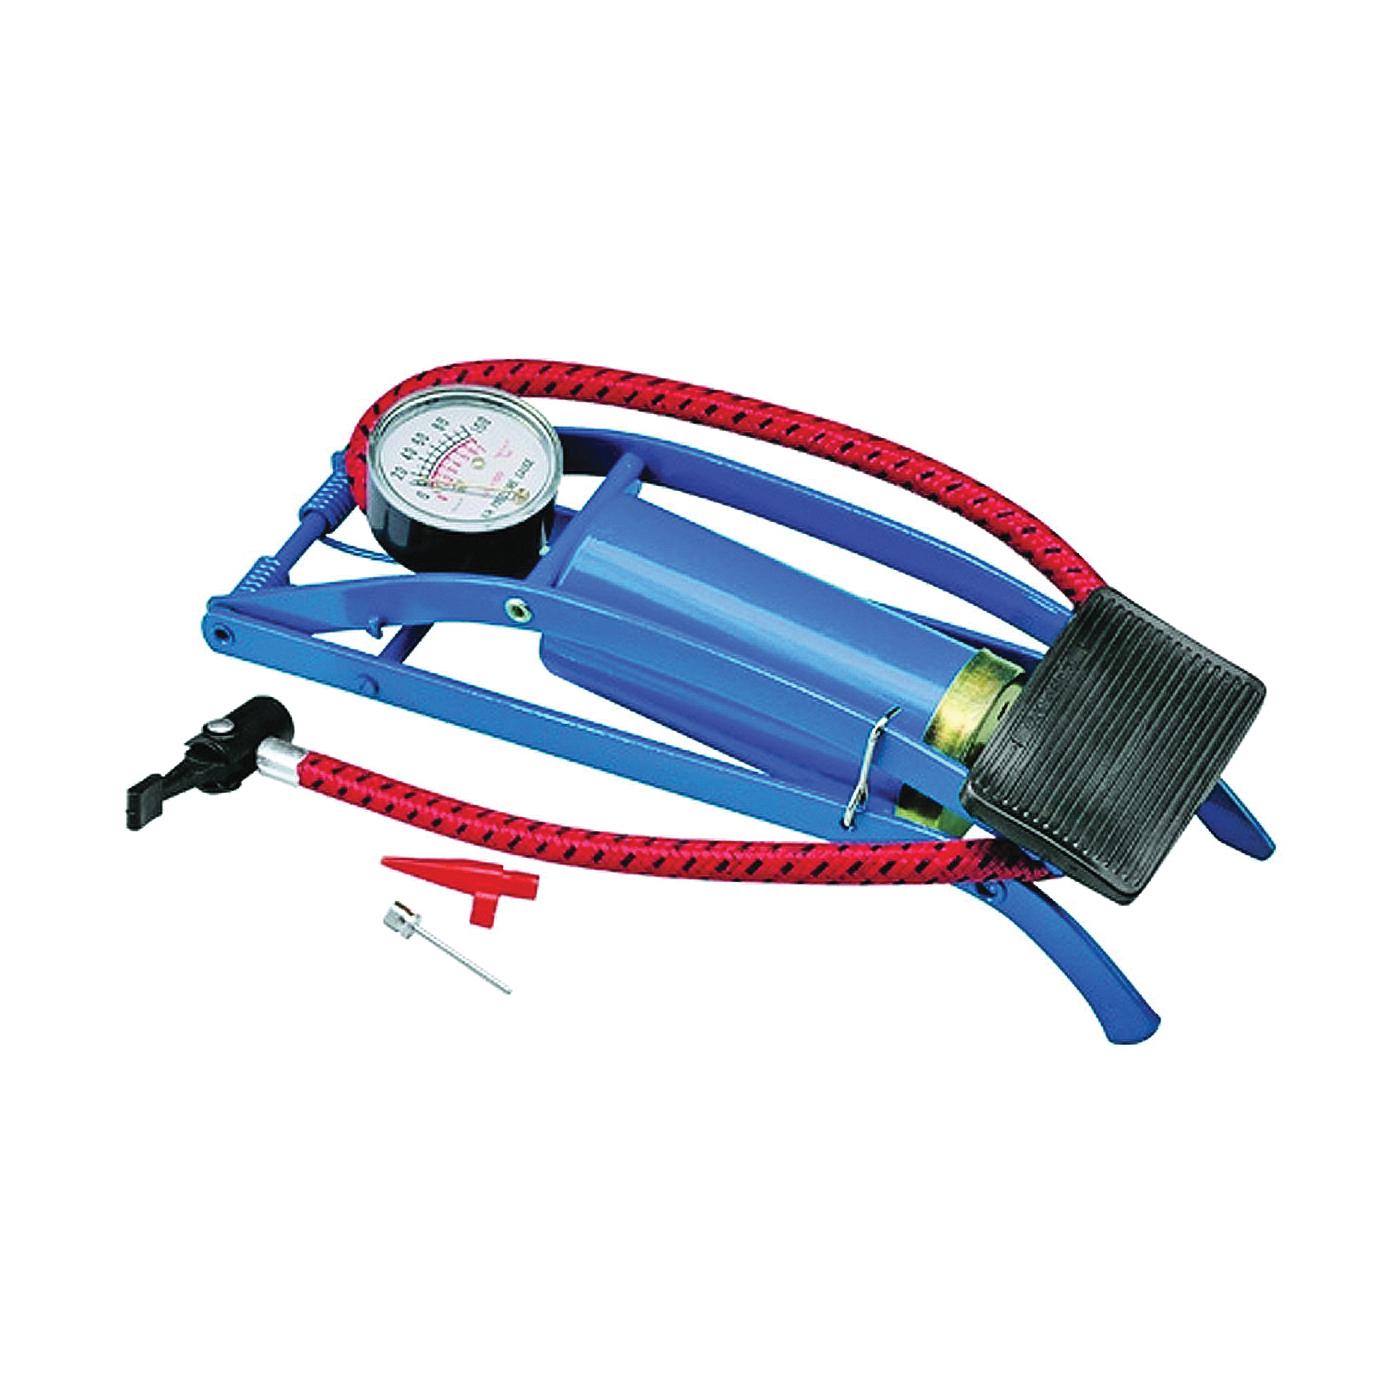 Picture of GENUINE VICTOR 08901-8 Foot Pump, 10 in W, 100 psi Max Pressure